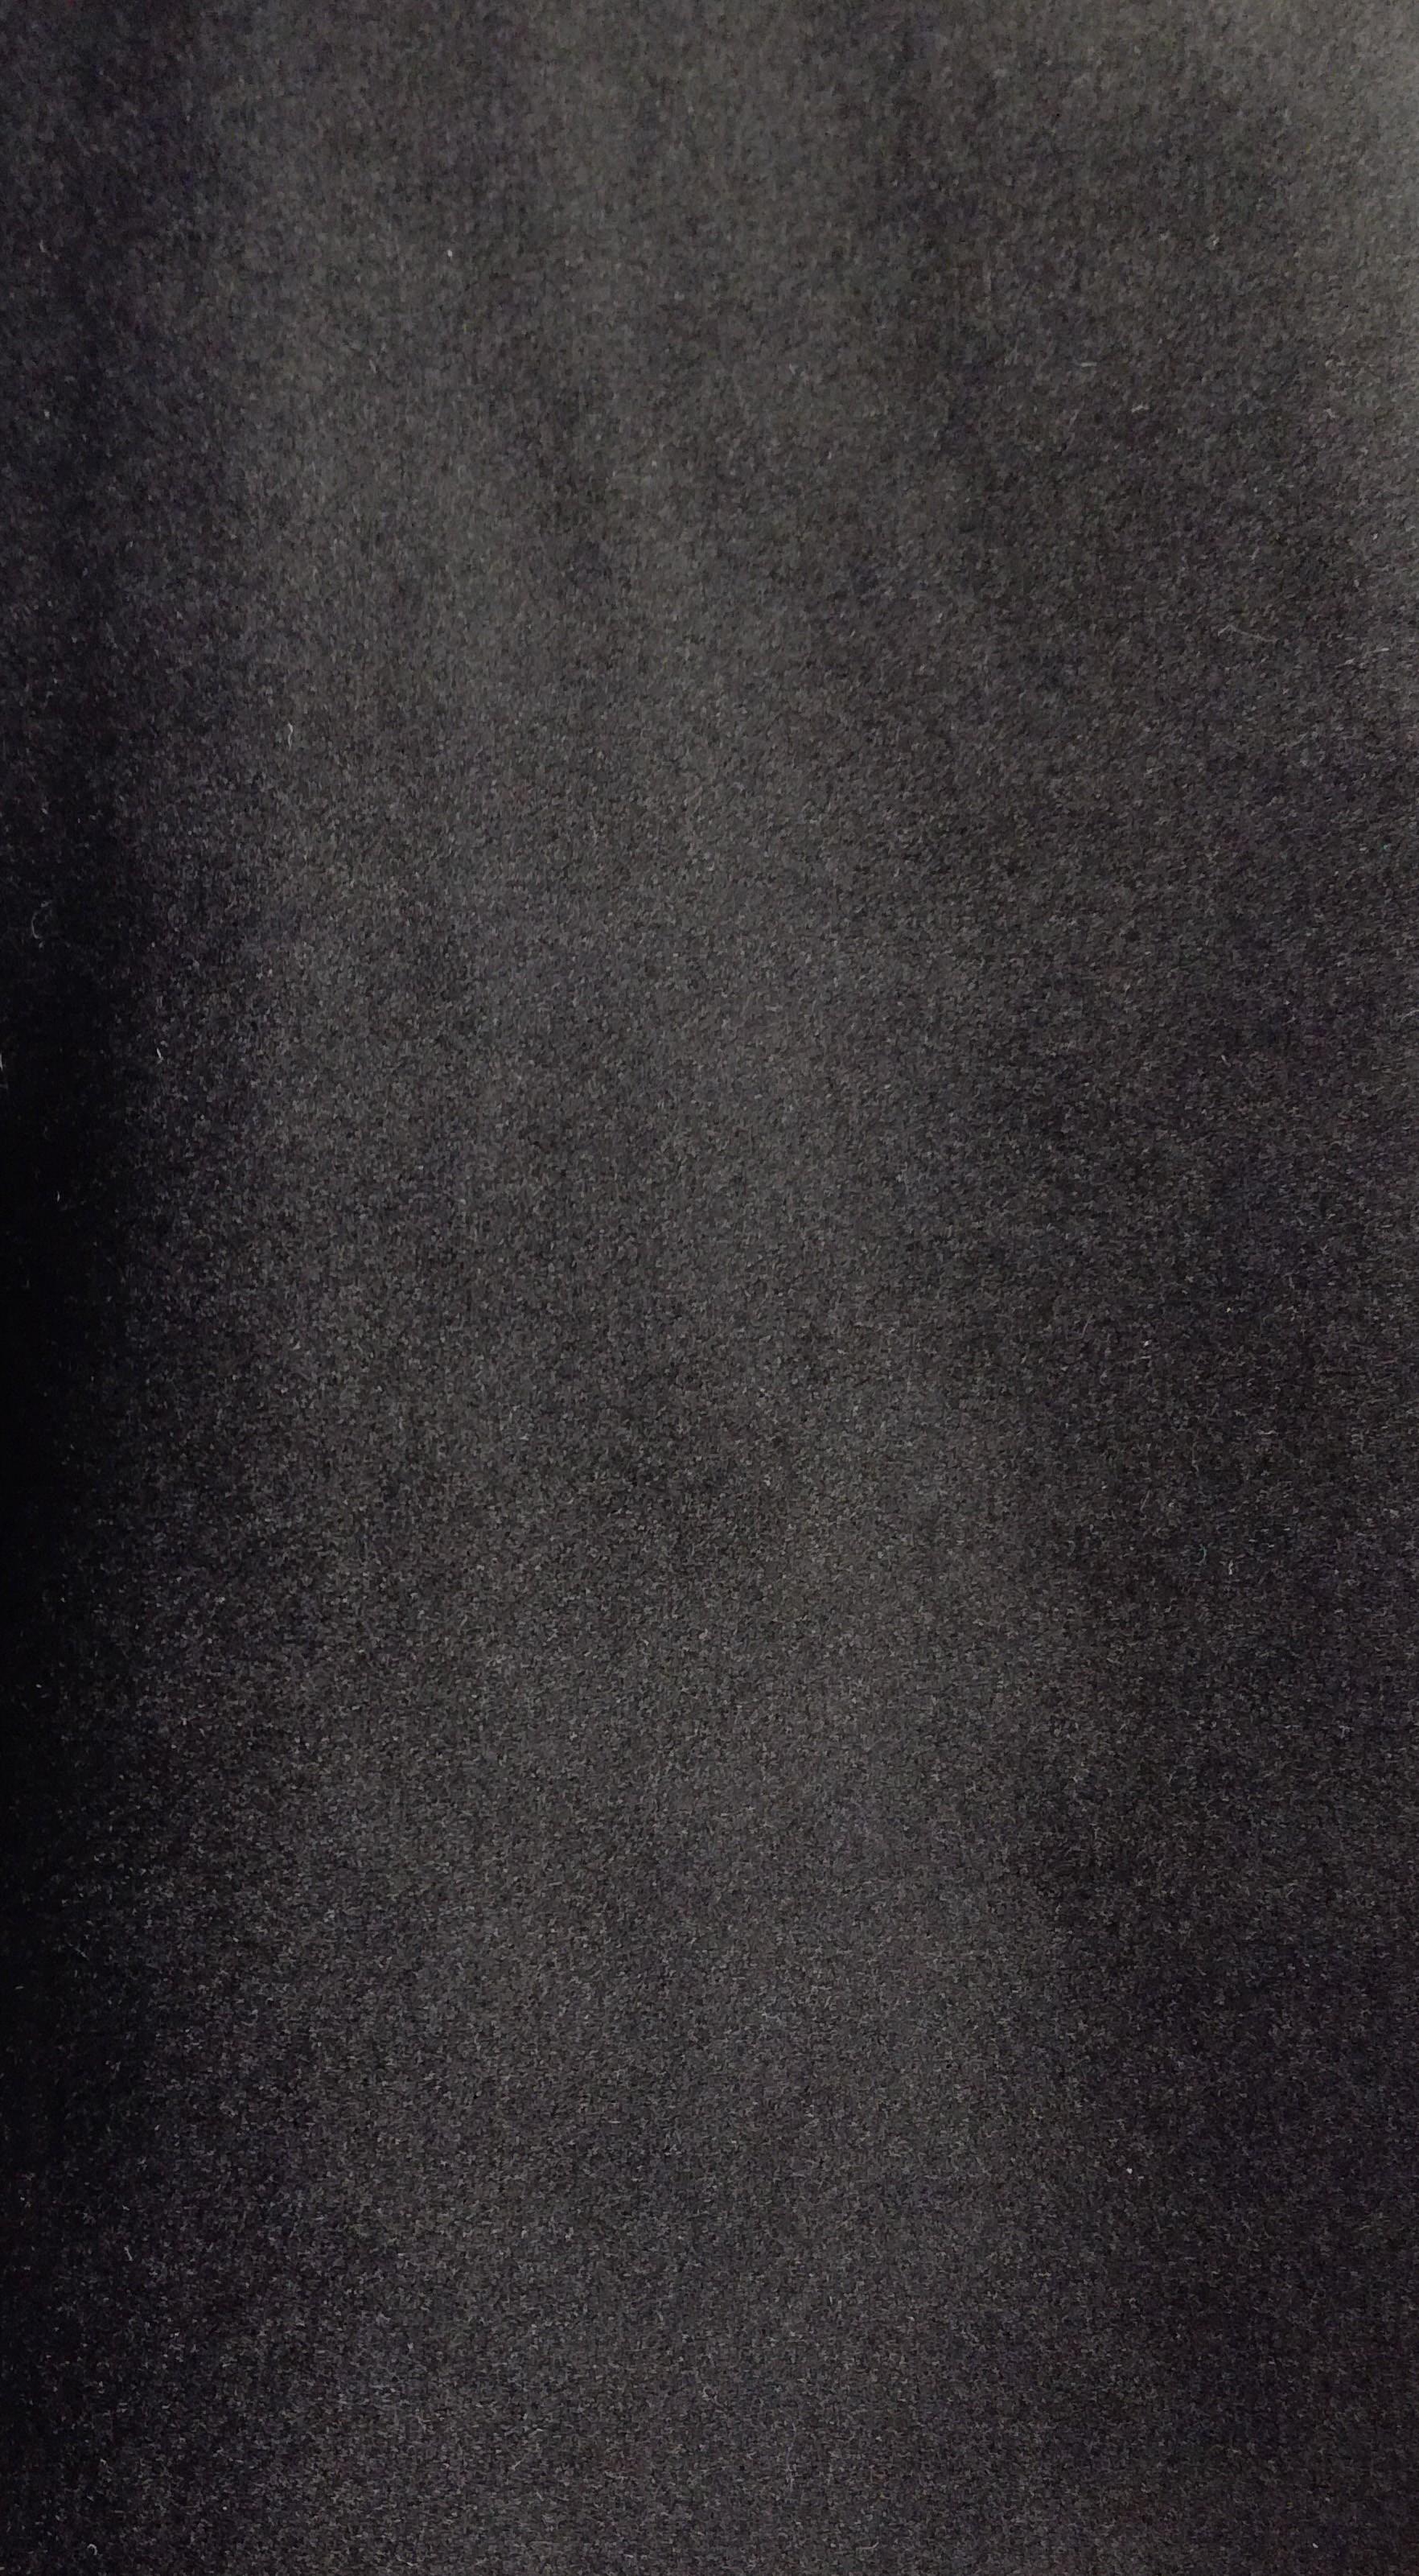 Gris 2731 / PU noir 1805